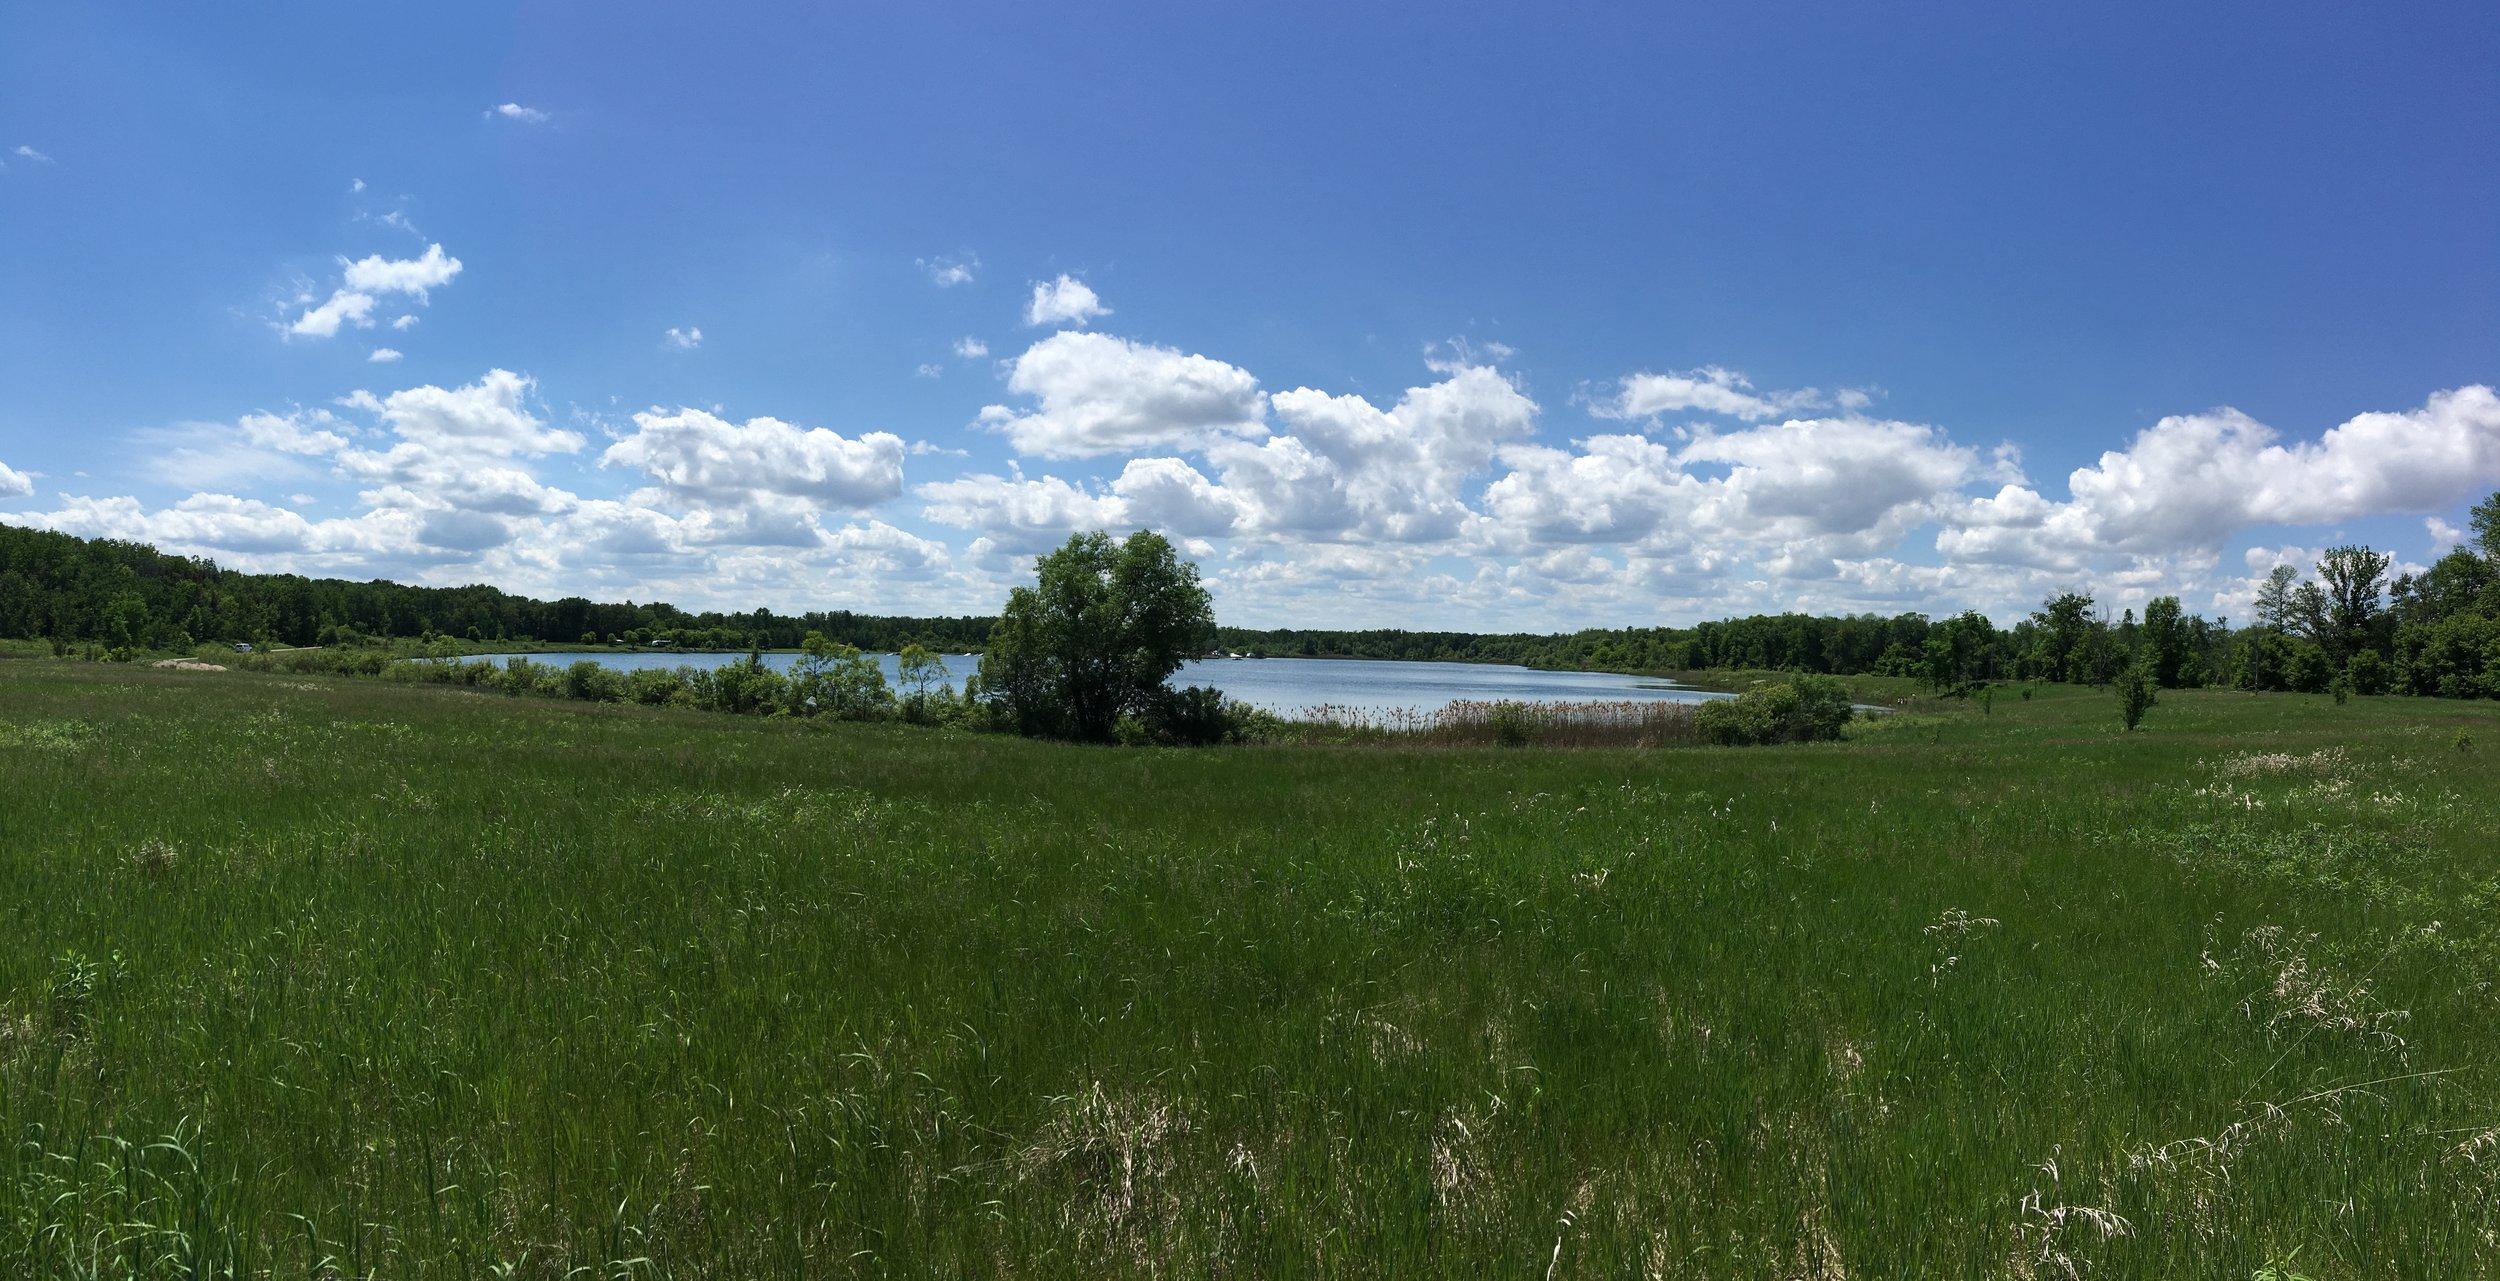 Spray Lake Water Sports Park - King Township, ON - Jun 8/18